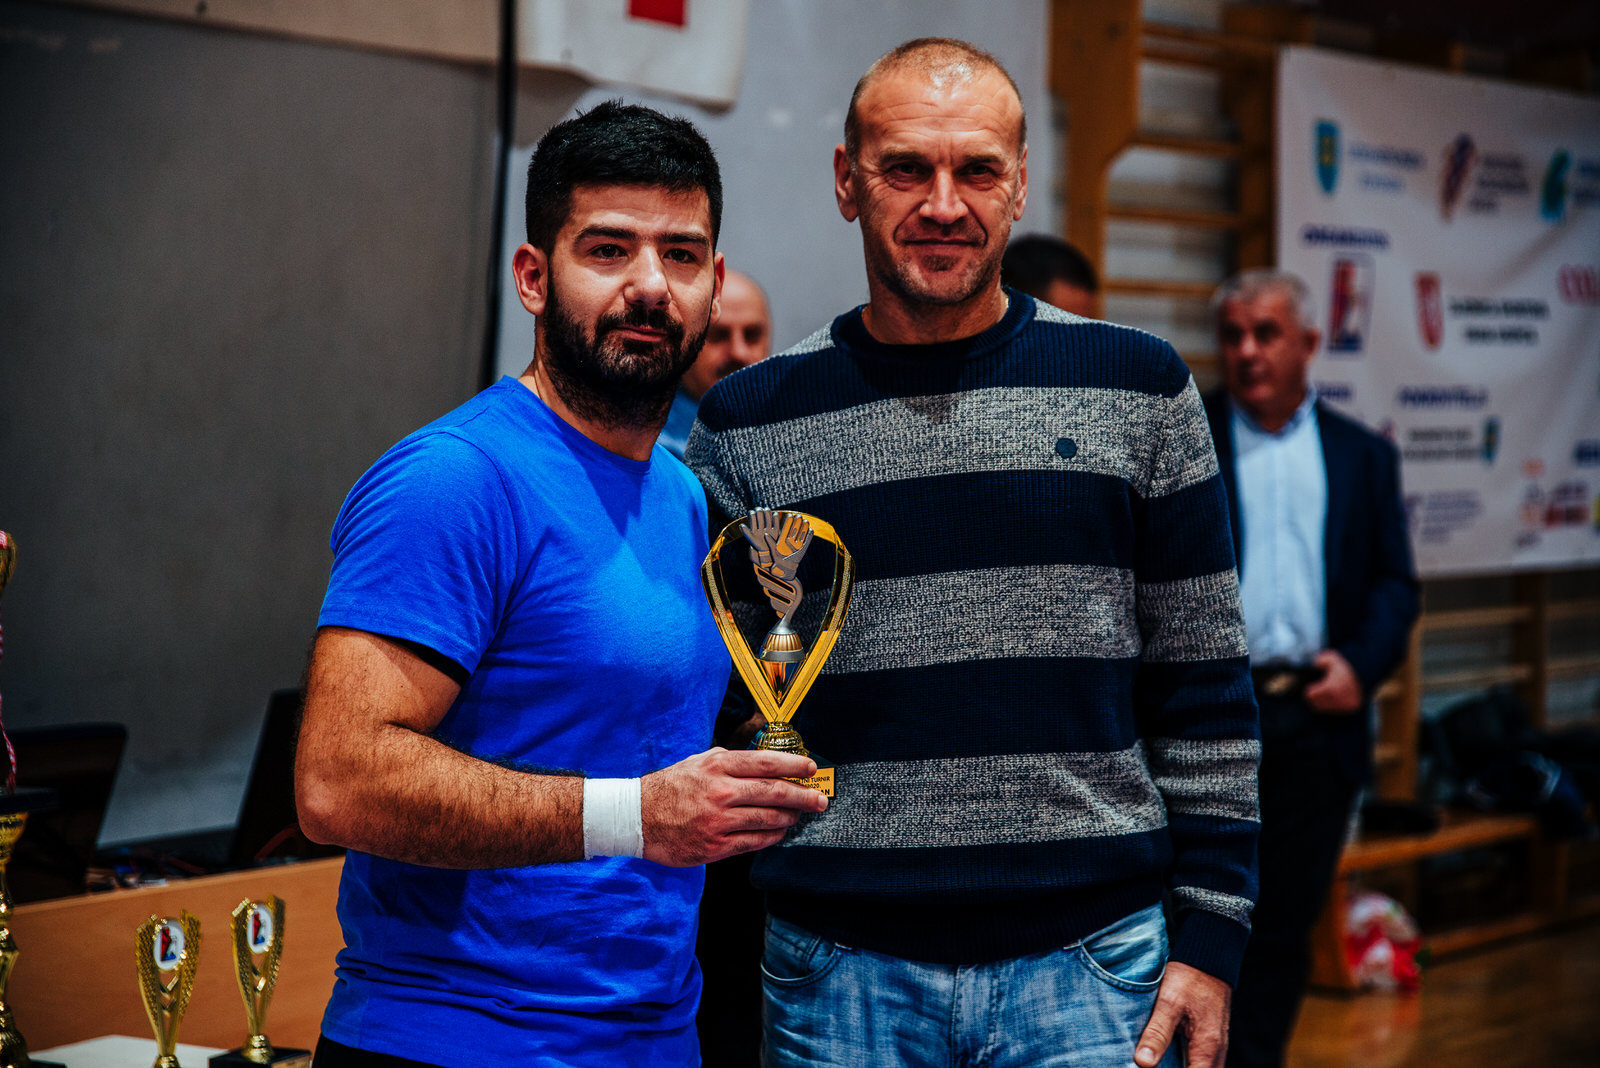 likaclub_zimska-malonogometna-liga-gospić_2019-20-129